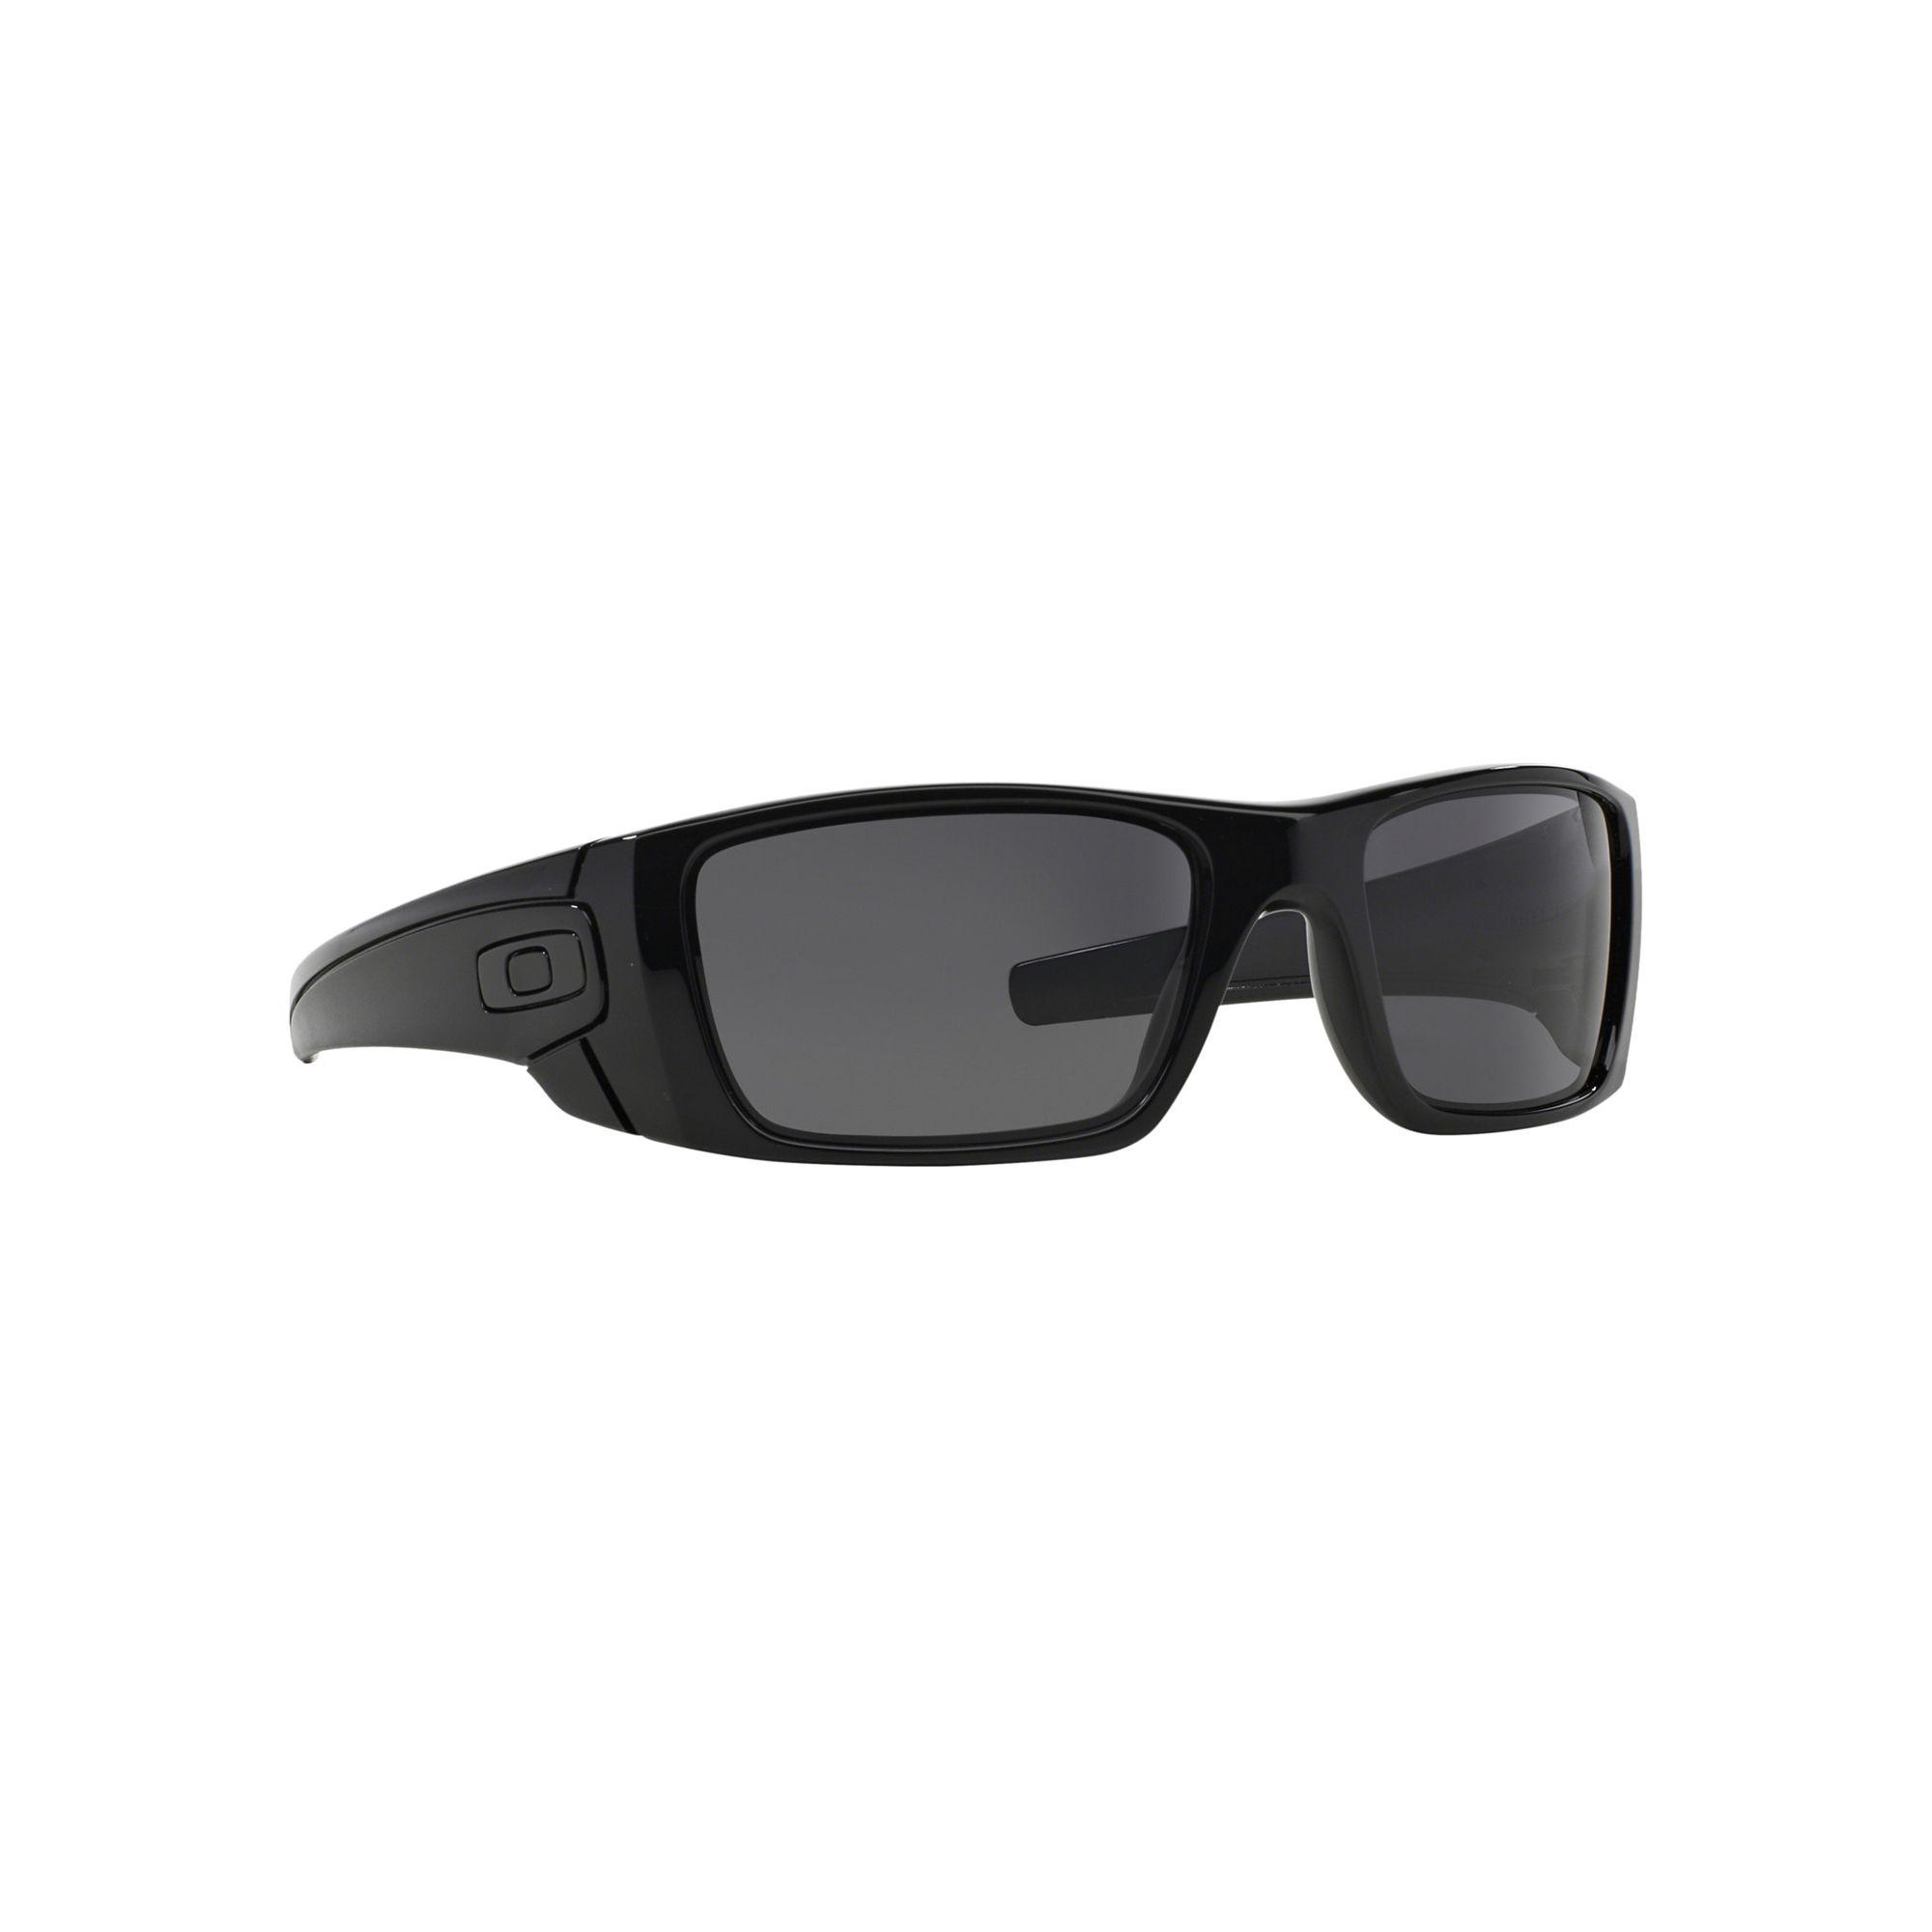 06aea5b4fd7 Oakley Black  fuel Cell  Oo9096 Square Sunglasses in Black for Men ...